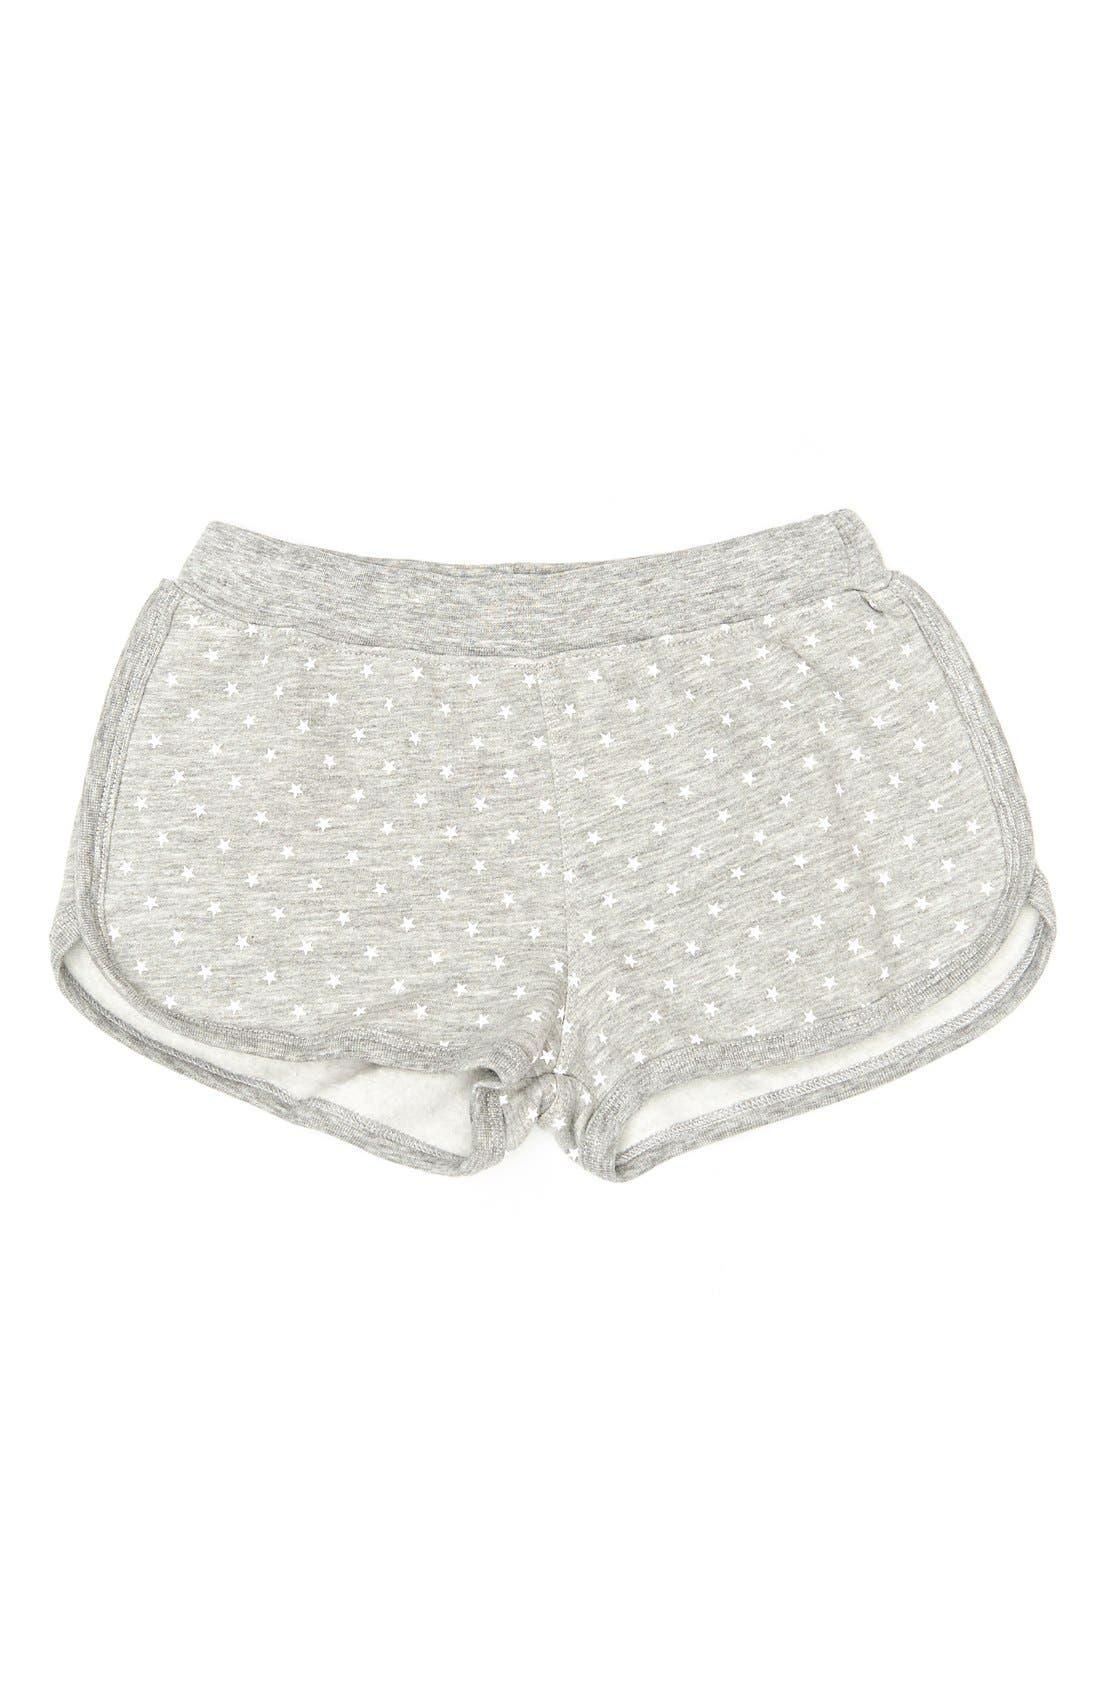 Alternate Image 1 Selected - Peek 'Mimi' Star Print Dolphin Shorts (Toddler Girls, Little Girls & Big Girls)